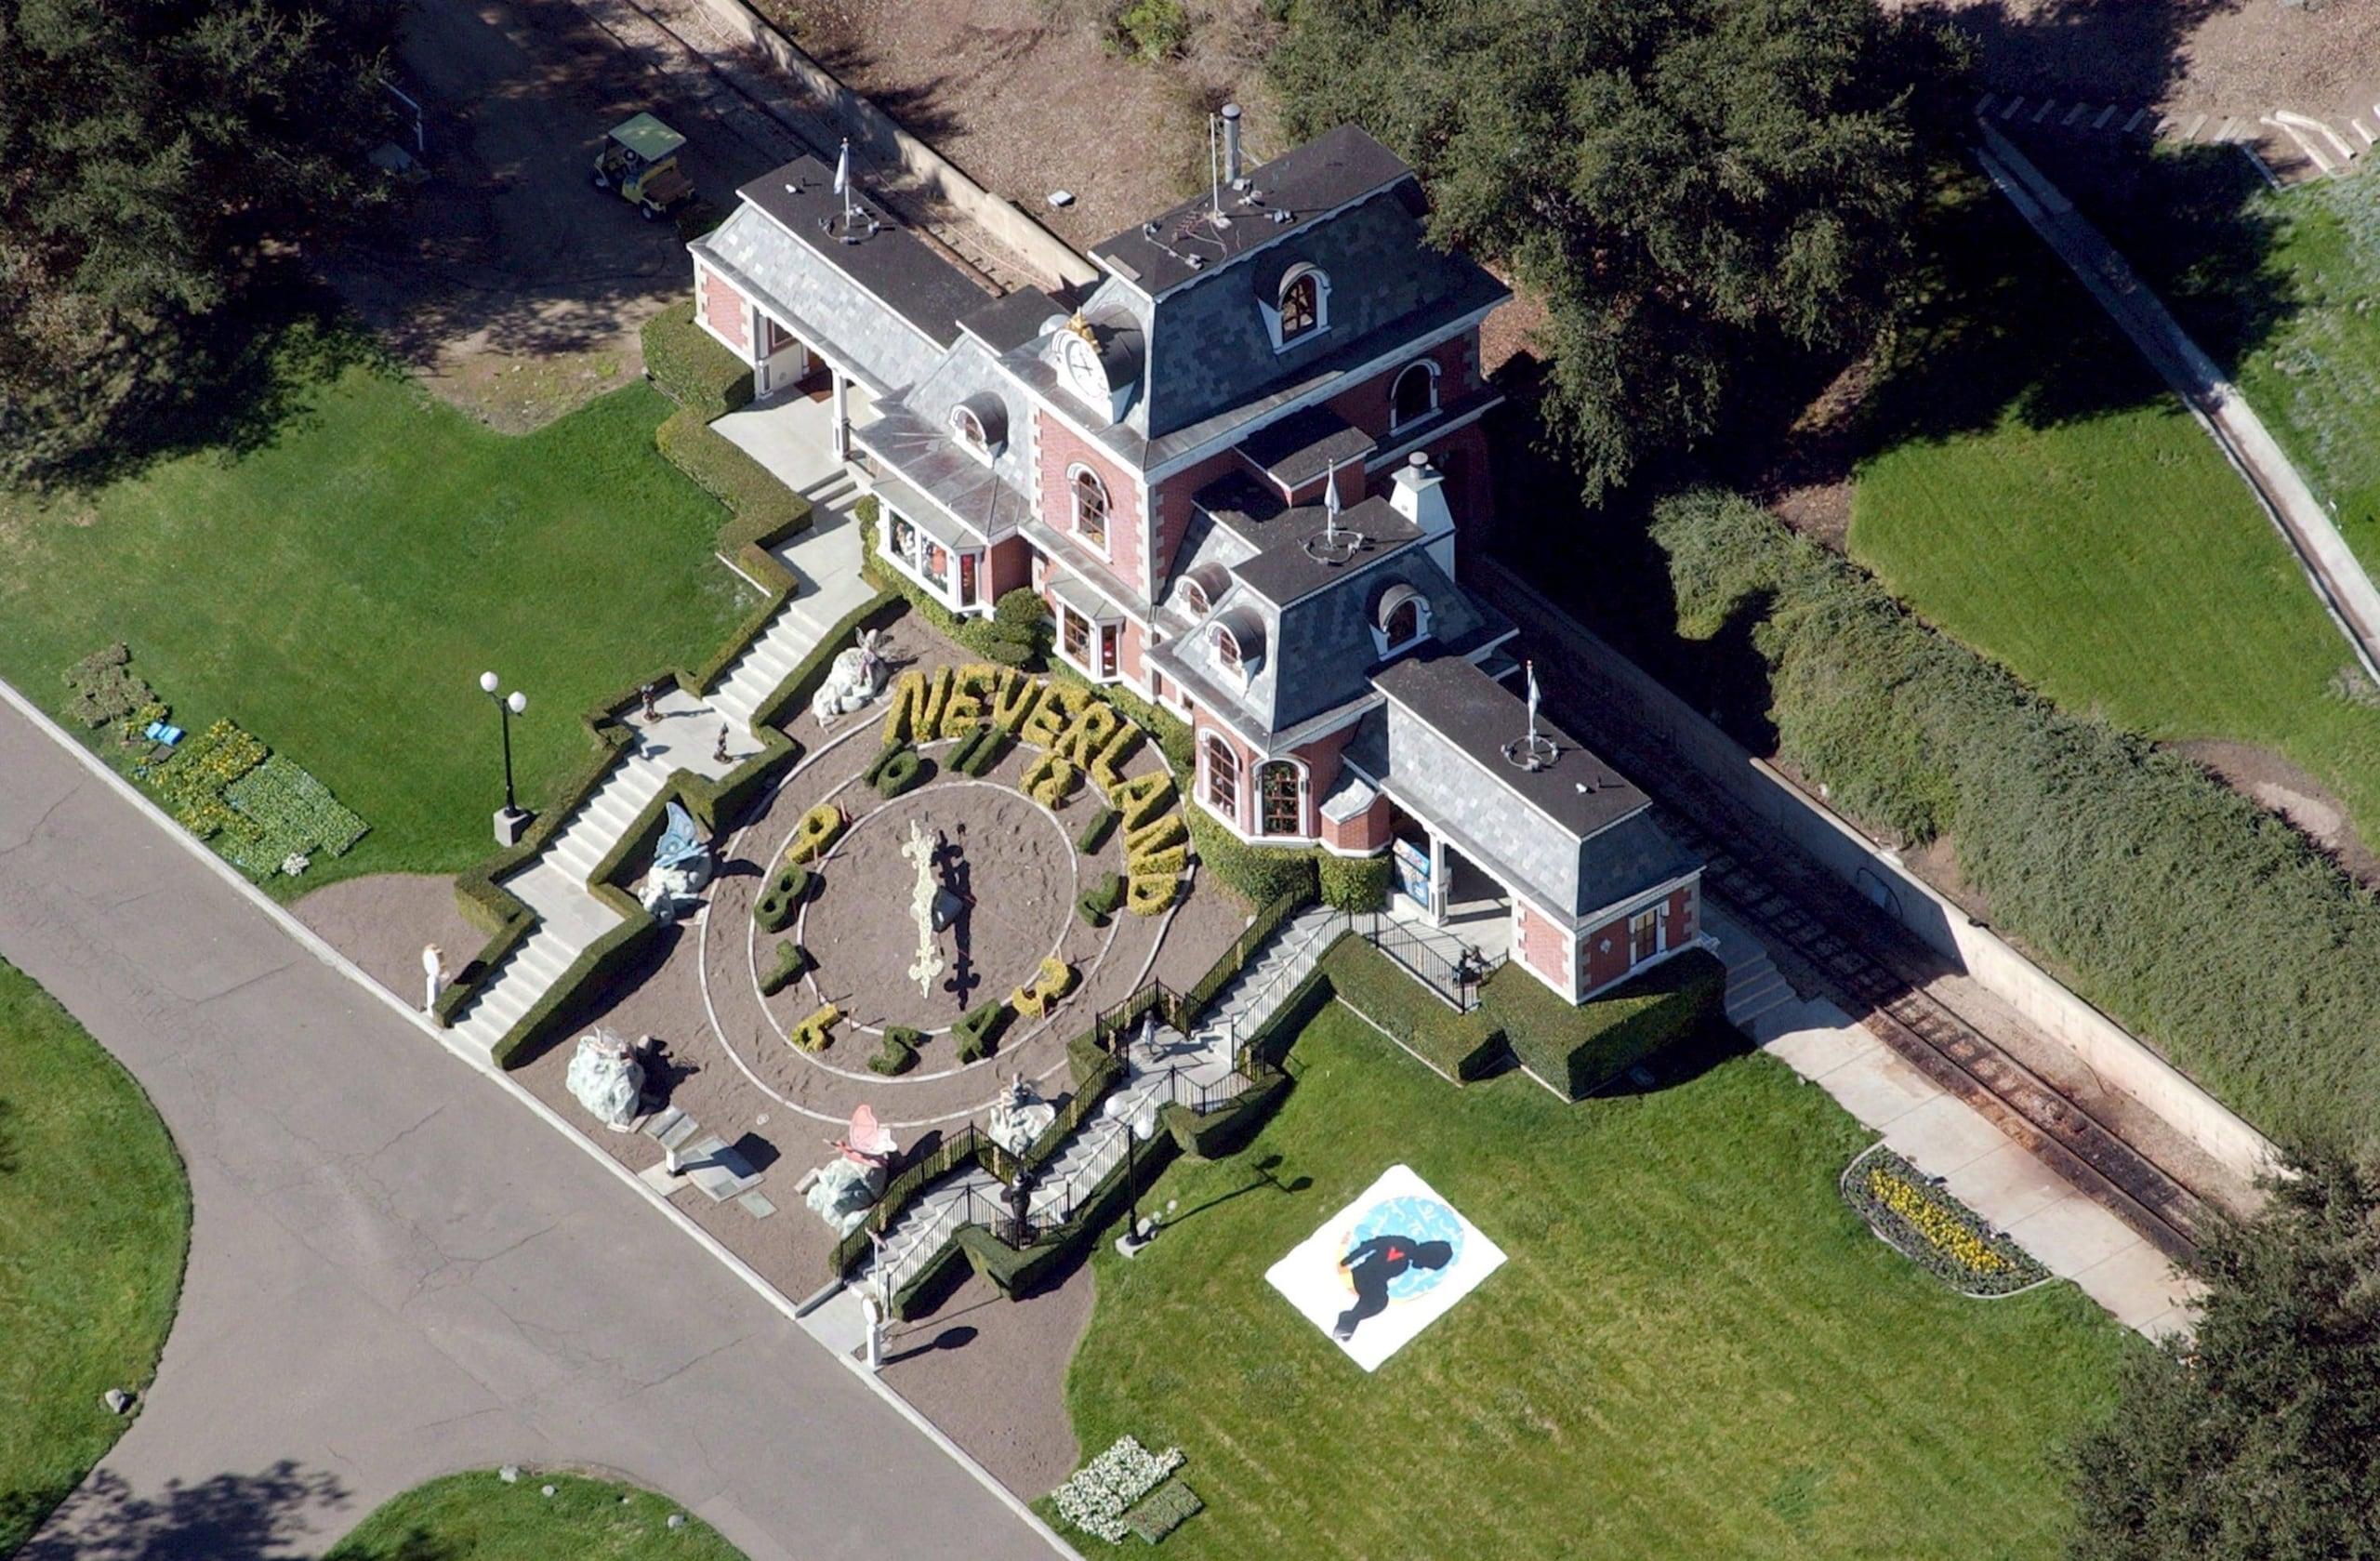 065221806 ca0906f5 457b 4fac b184 12b56bf96876 - Musica, miliardario Usa compra 'Neverland' di Michael Jackson